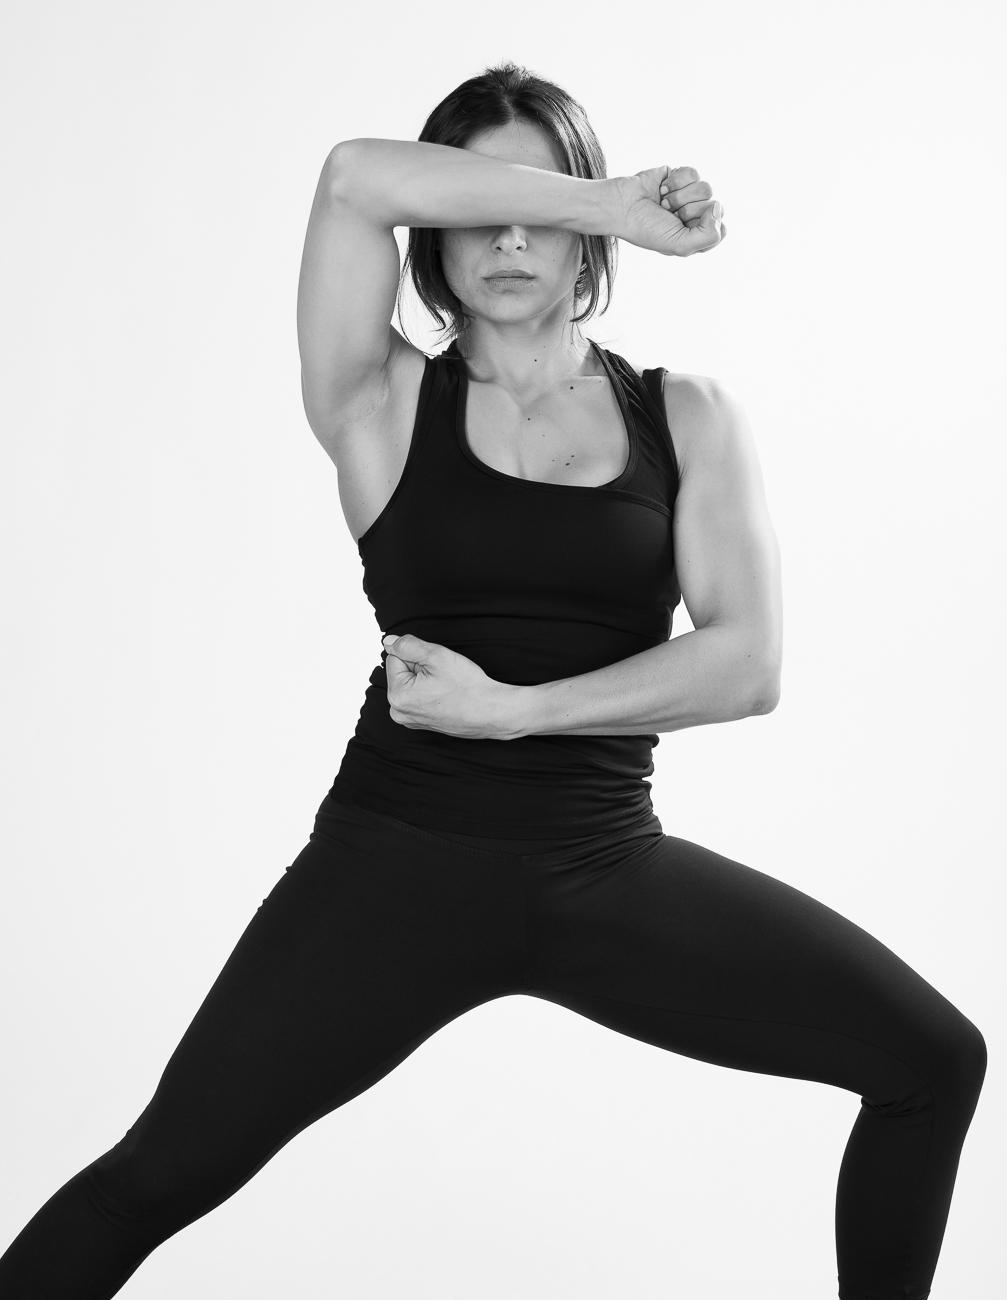 Gonçalo Barriga Photographer - Studio Portrait of Athlete